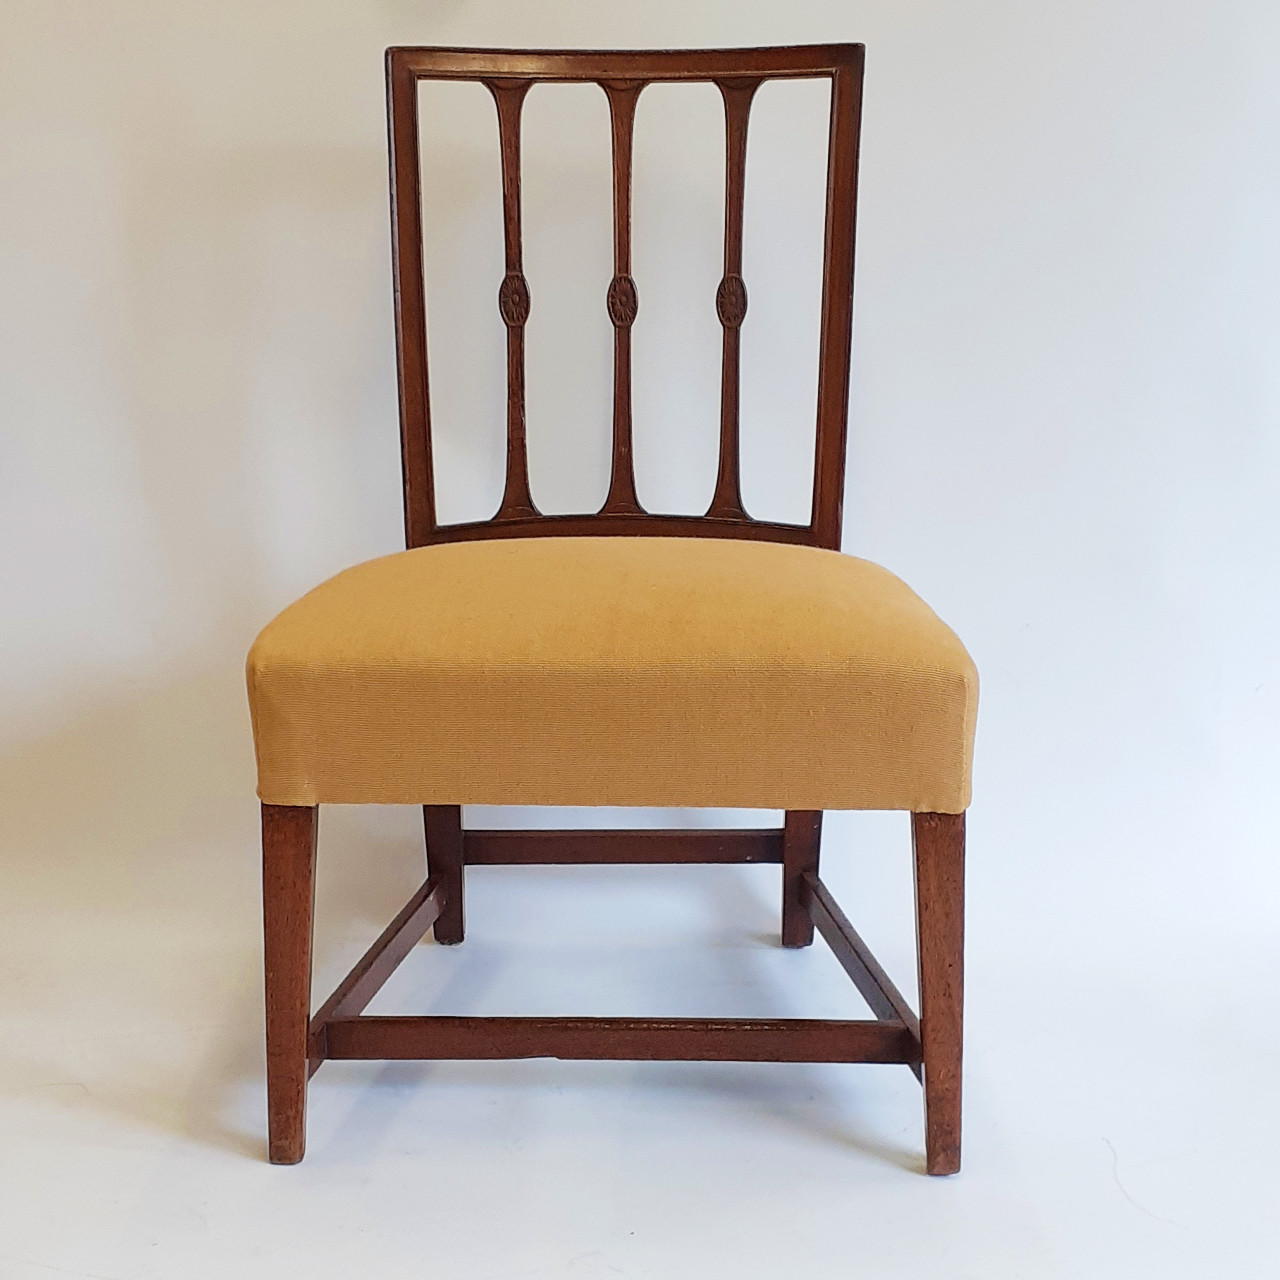 occasional chair in ochre linen